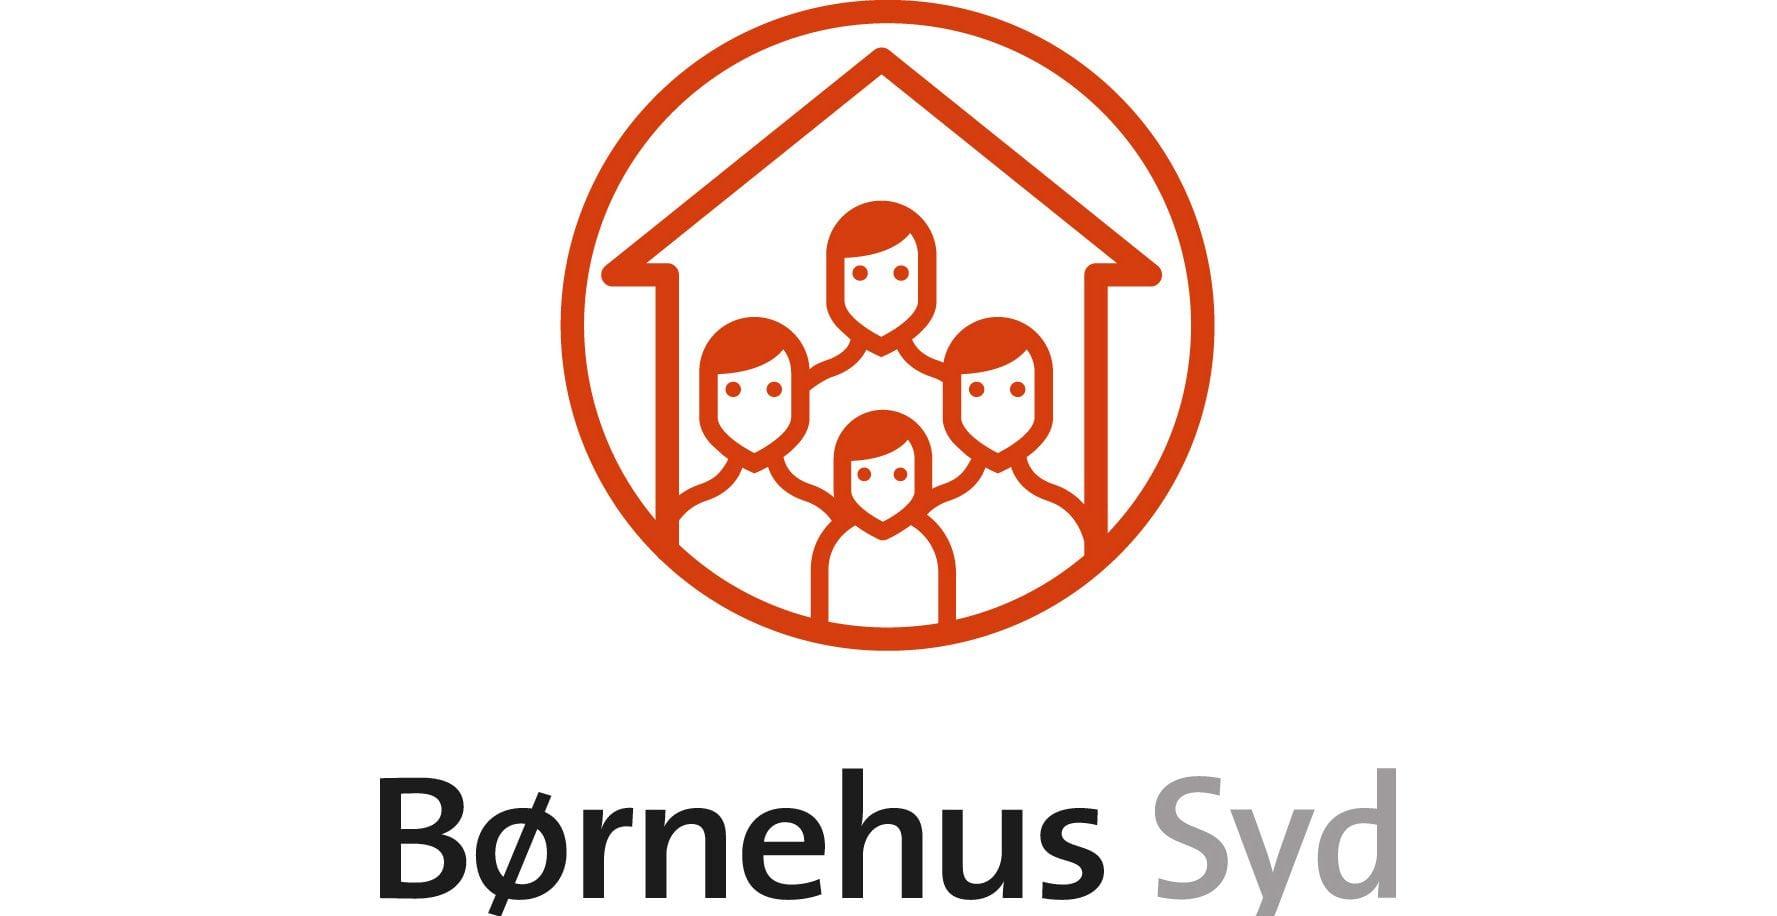 Børnehus Syd logo